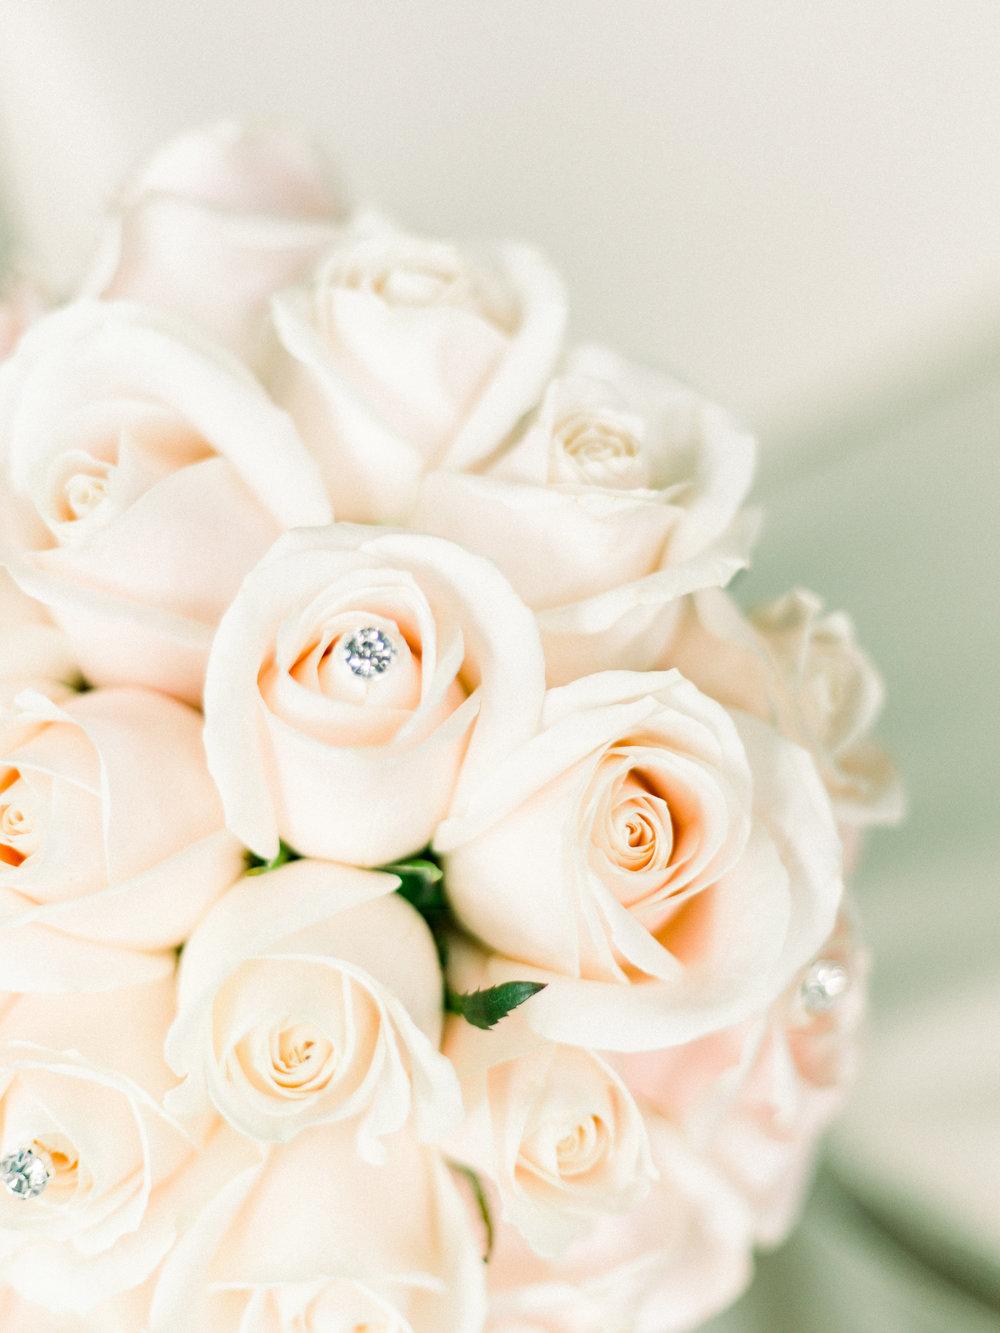 katie_graham_photography_wedding_photographer_jamestown_new_york_bemus_point_lakewood